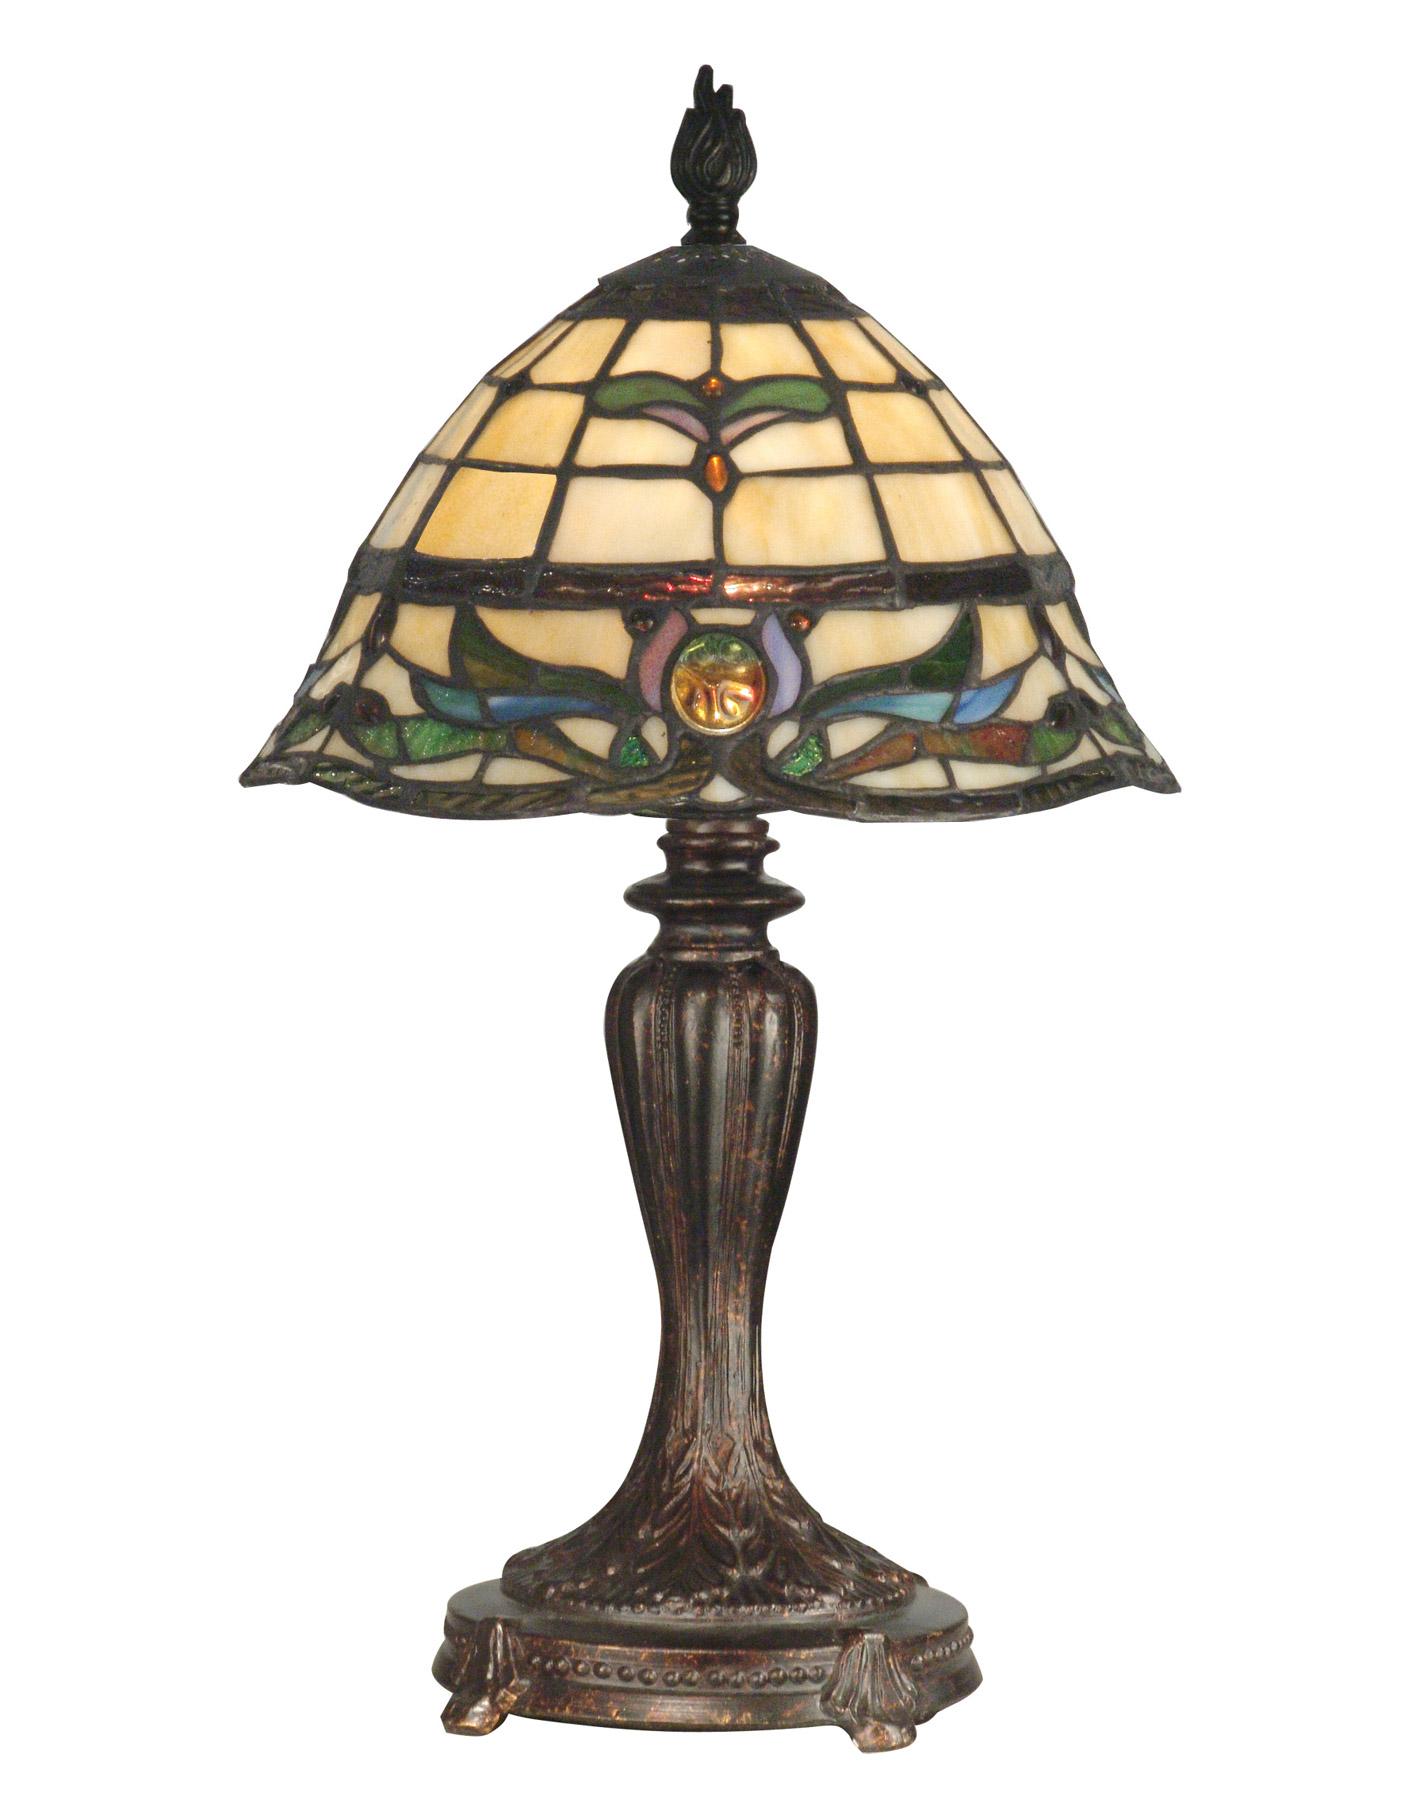 Dale Tiffany Tt10087 Tiffany Accent Lamp